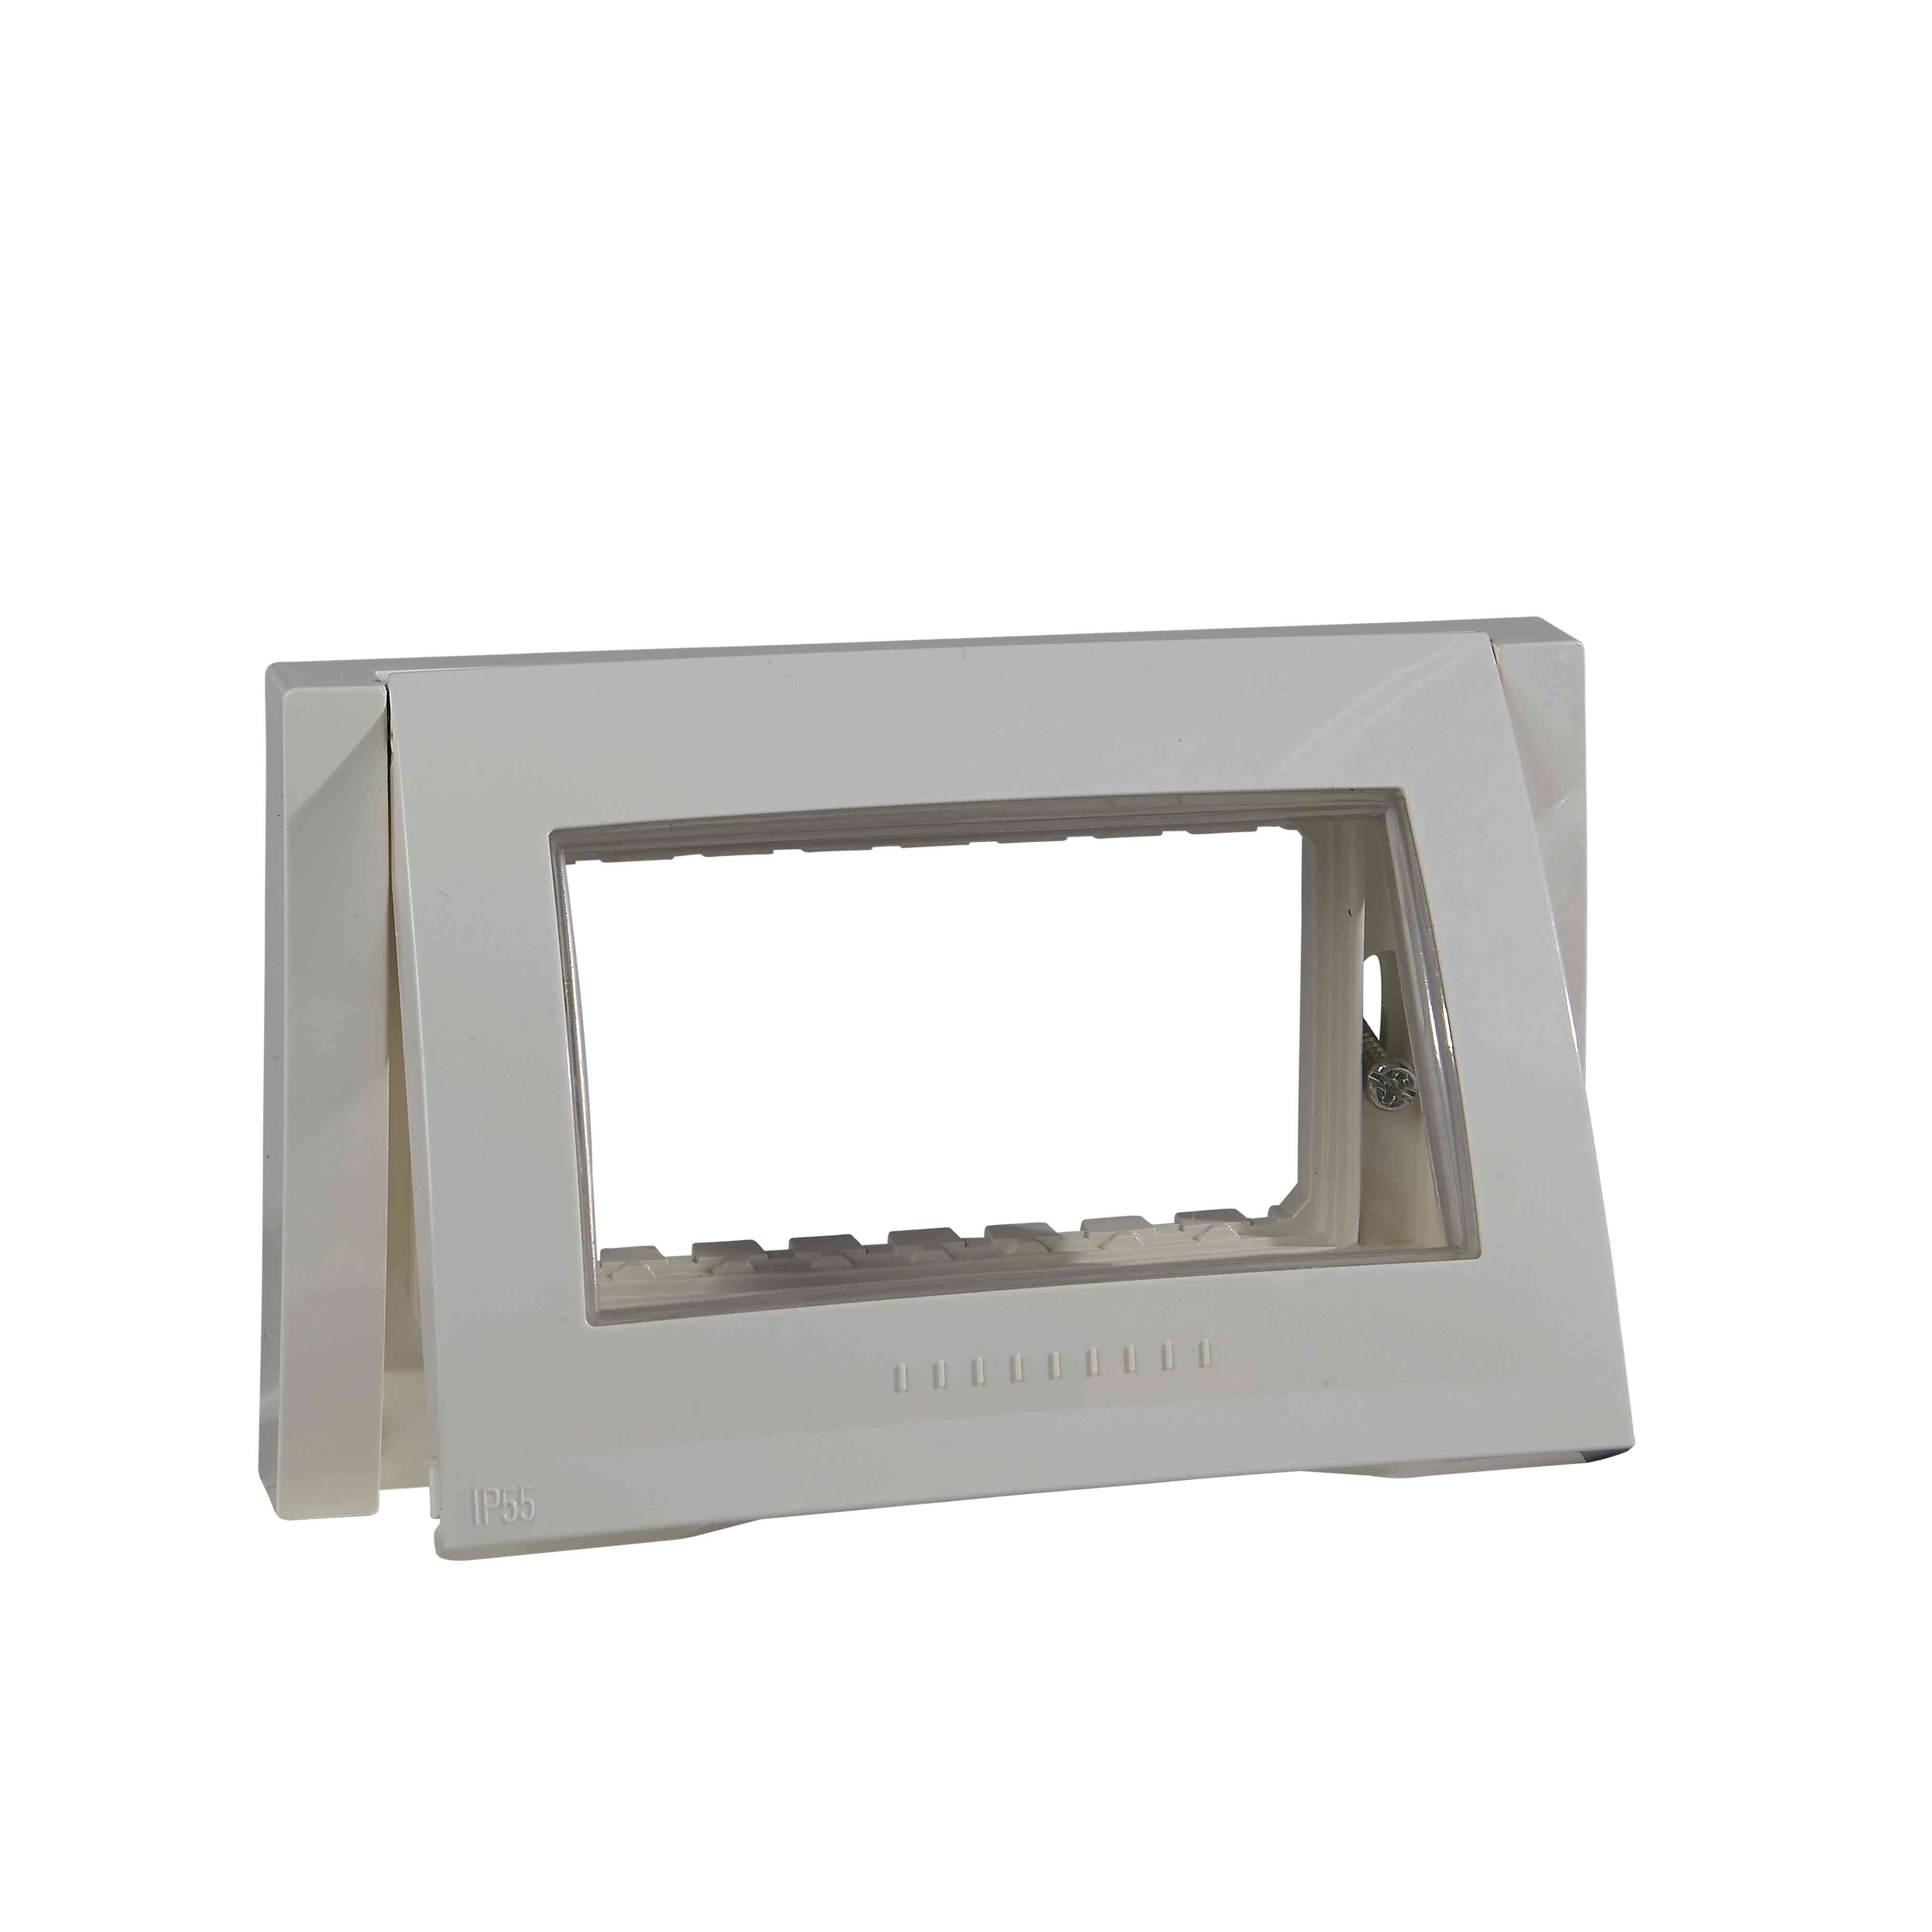 Unica Plus - dekorativni okvir (nos. okvir) - 1 odprtina - 4 m - bež/bež - IP55